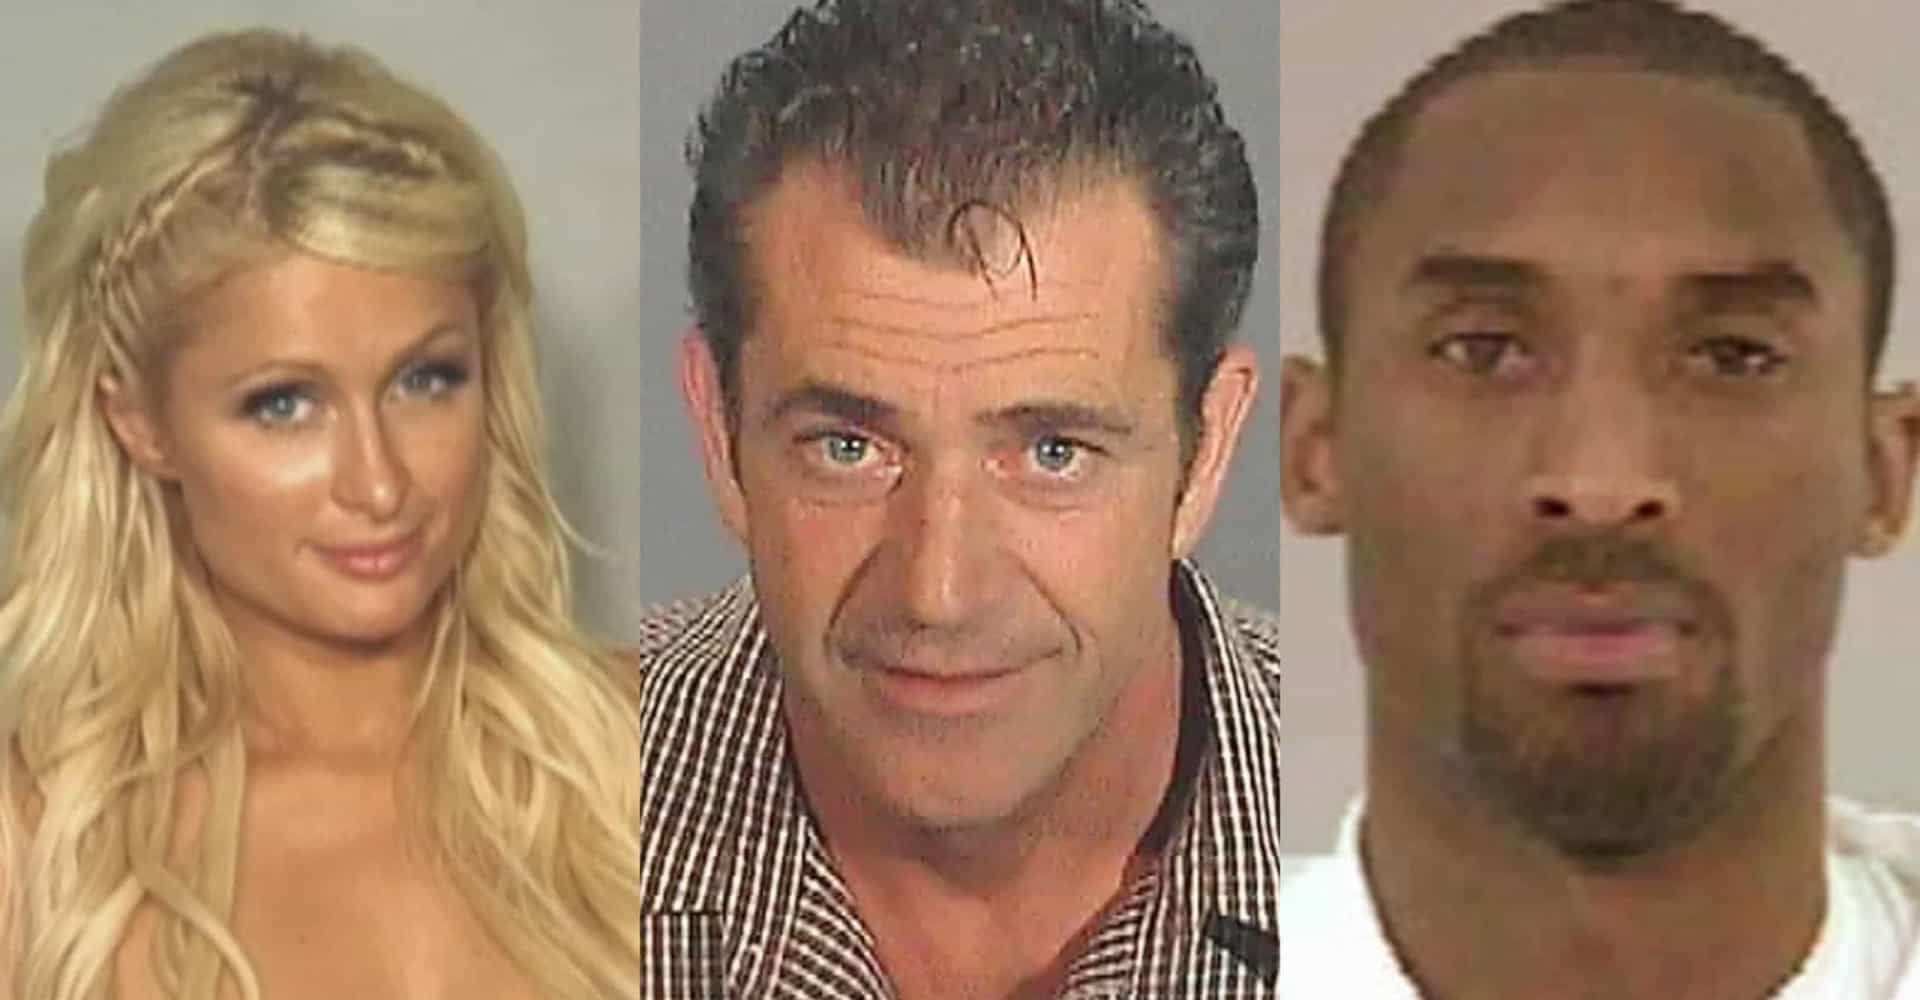 Mug shots of celebs you forgot had criminal records